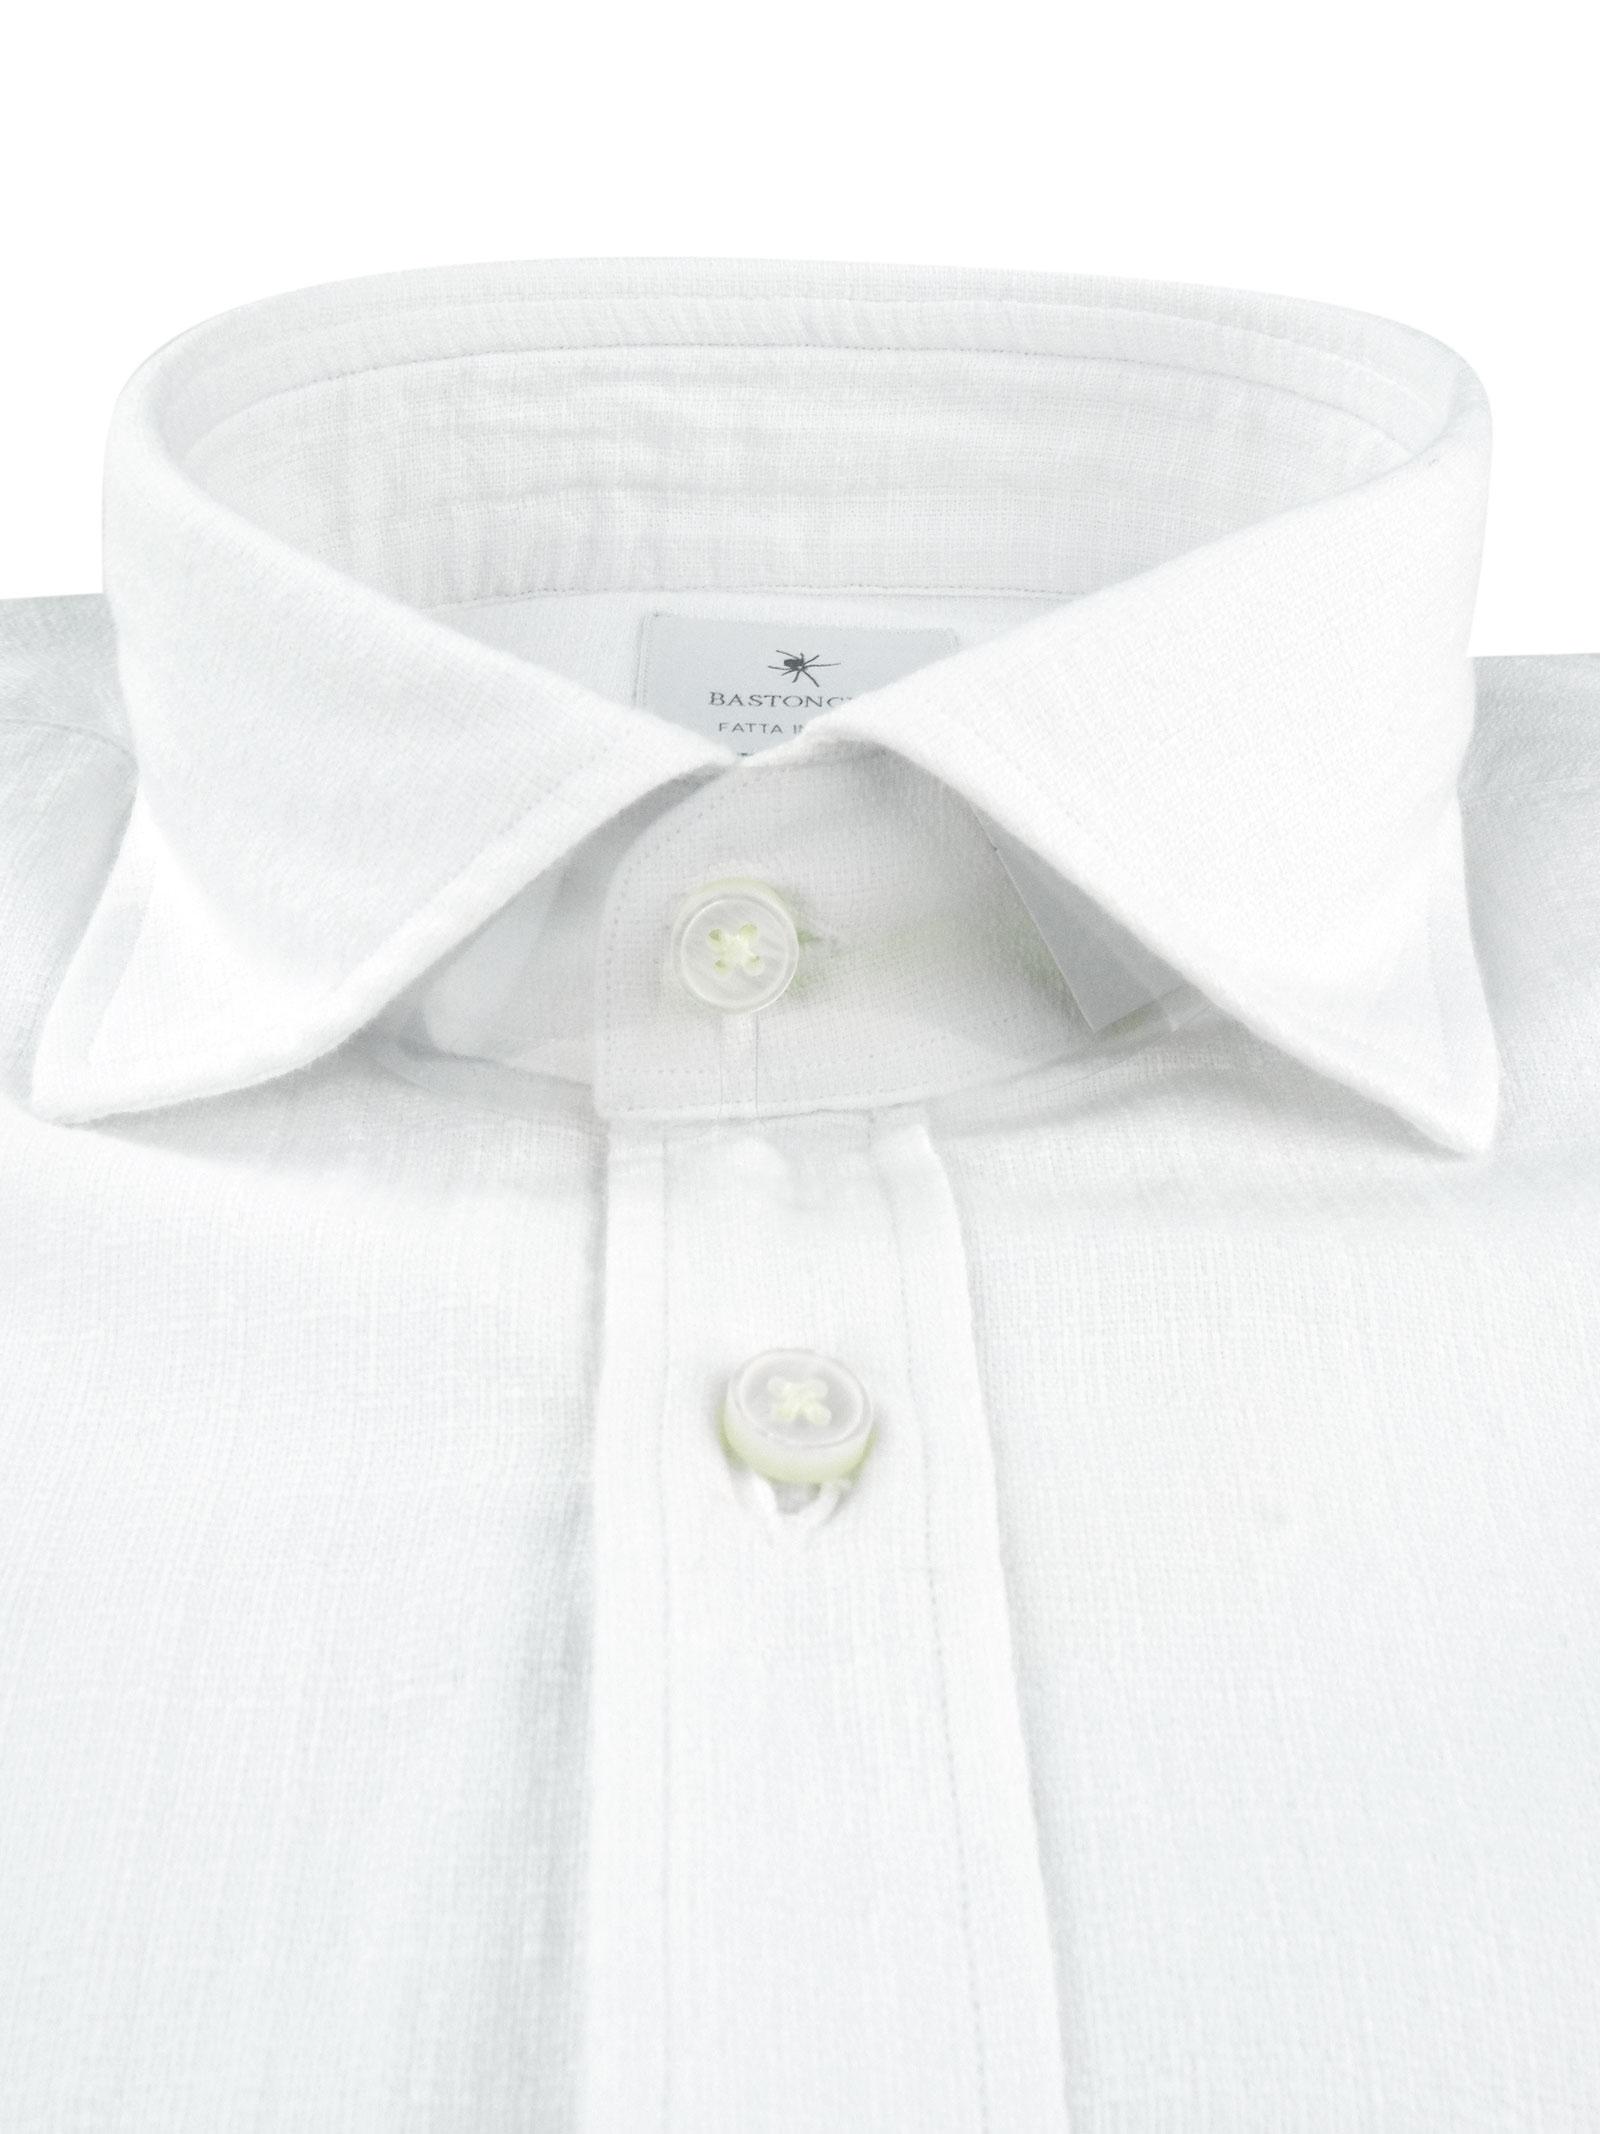 Garment dyed  , cotton twill shirt, regular fit BASTONCINO | Shirts | SARTB1379 01